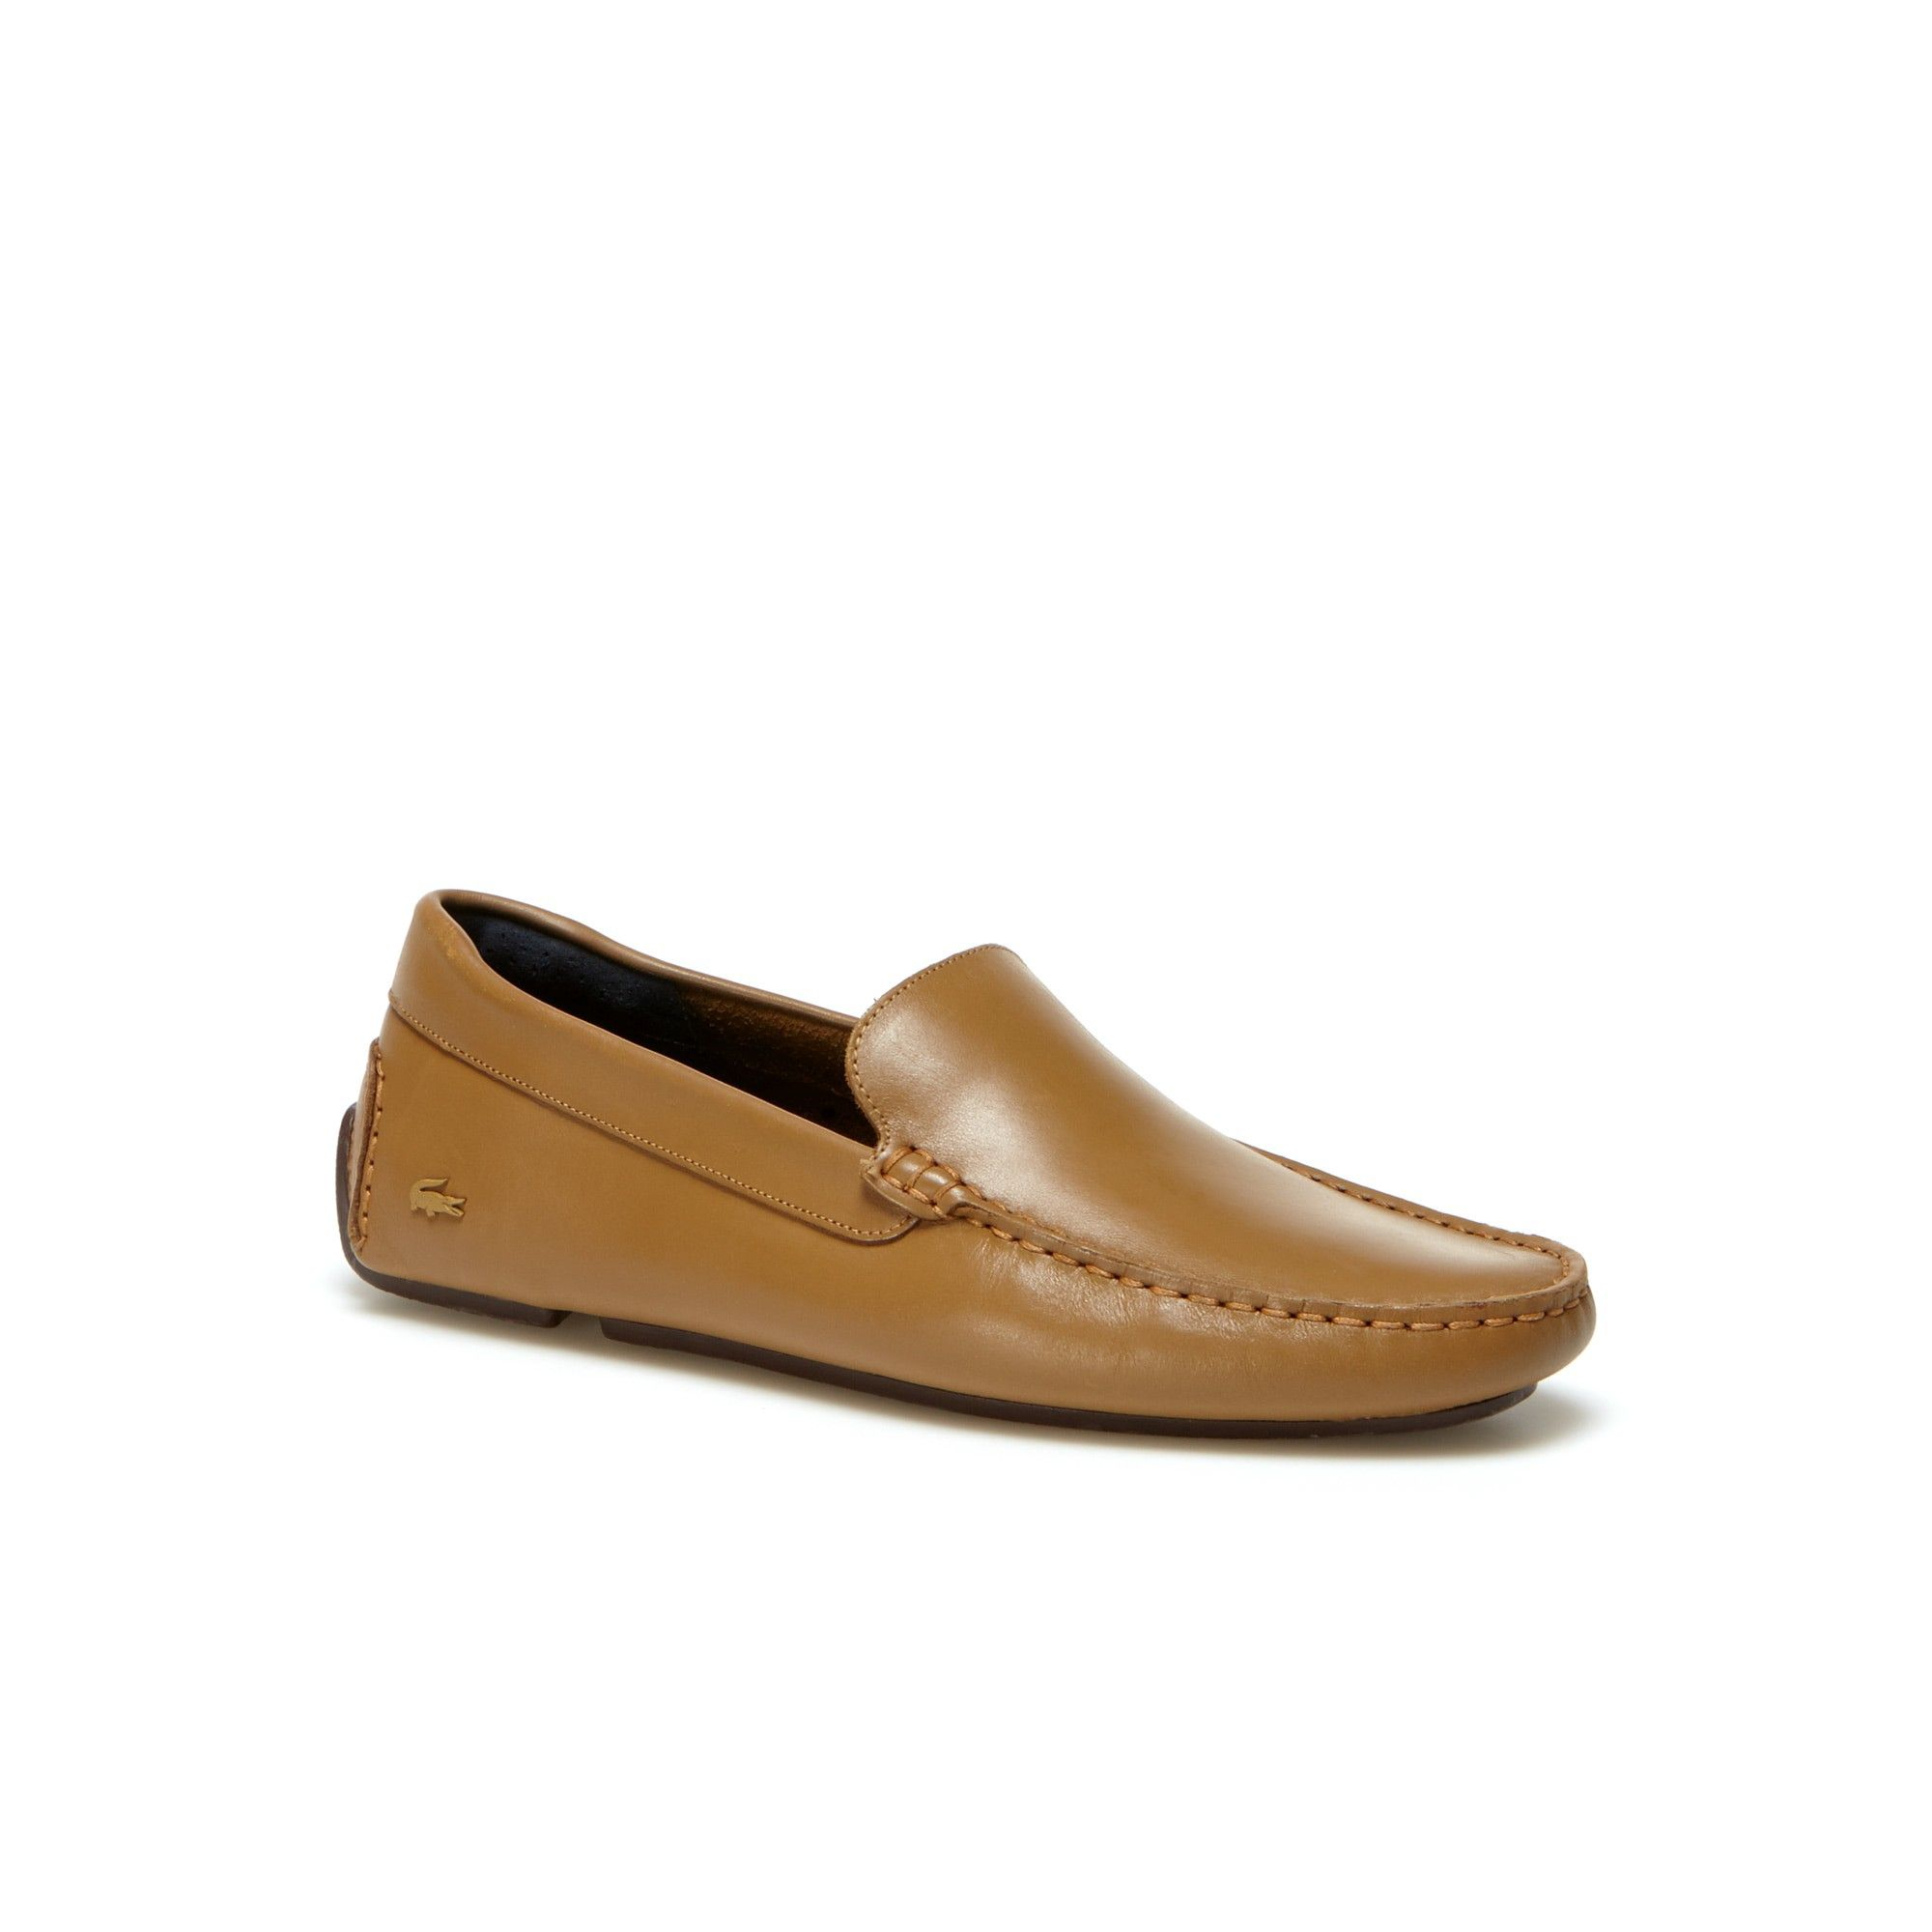 c4568b6f04b LACOSTE Men s Piloter Leather Moccasins - tan.  lacoste  shoes ...